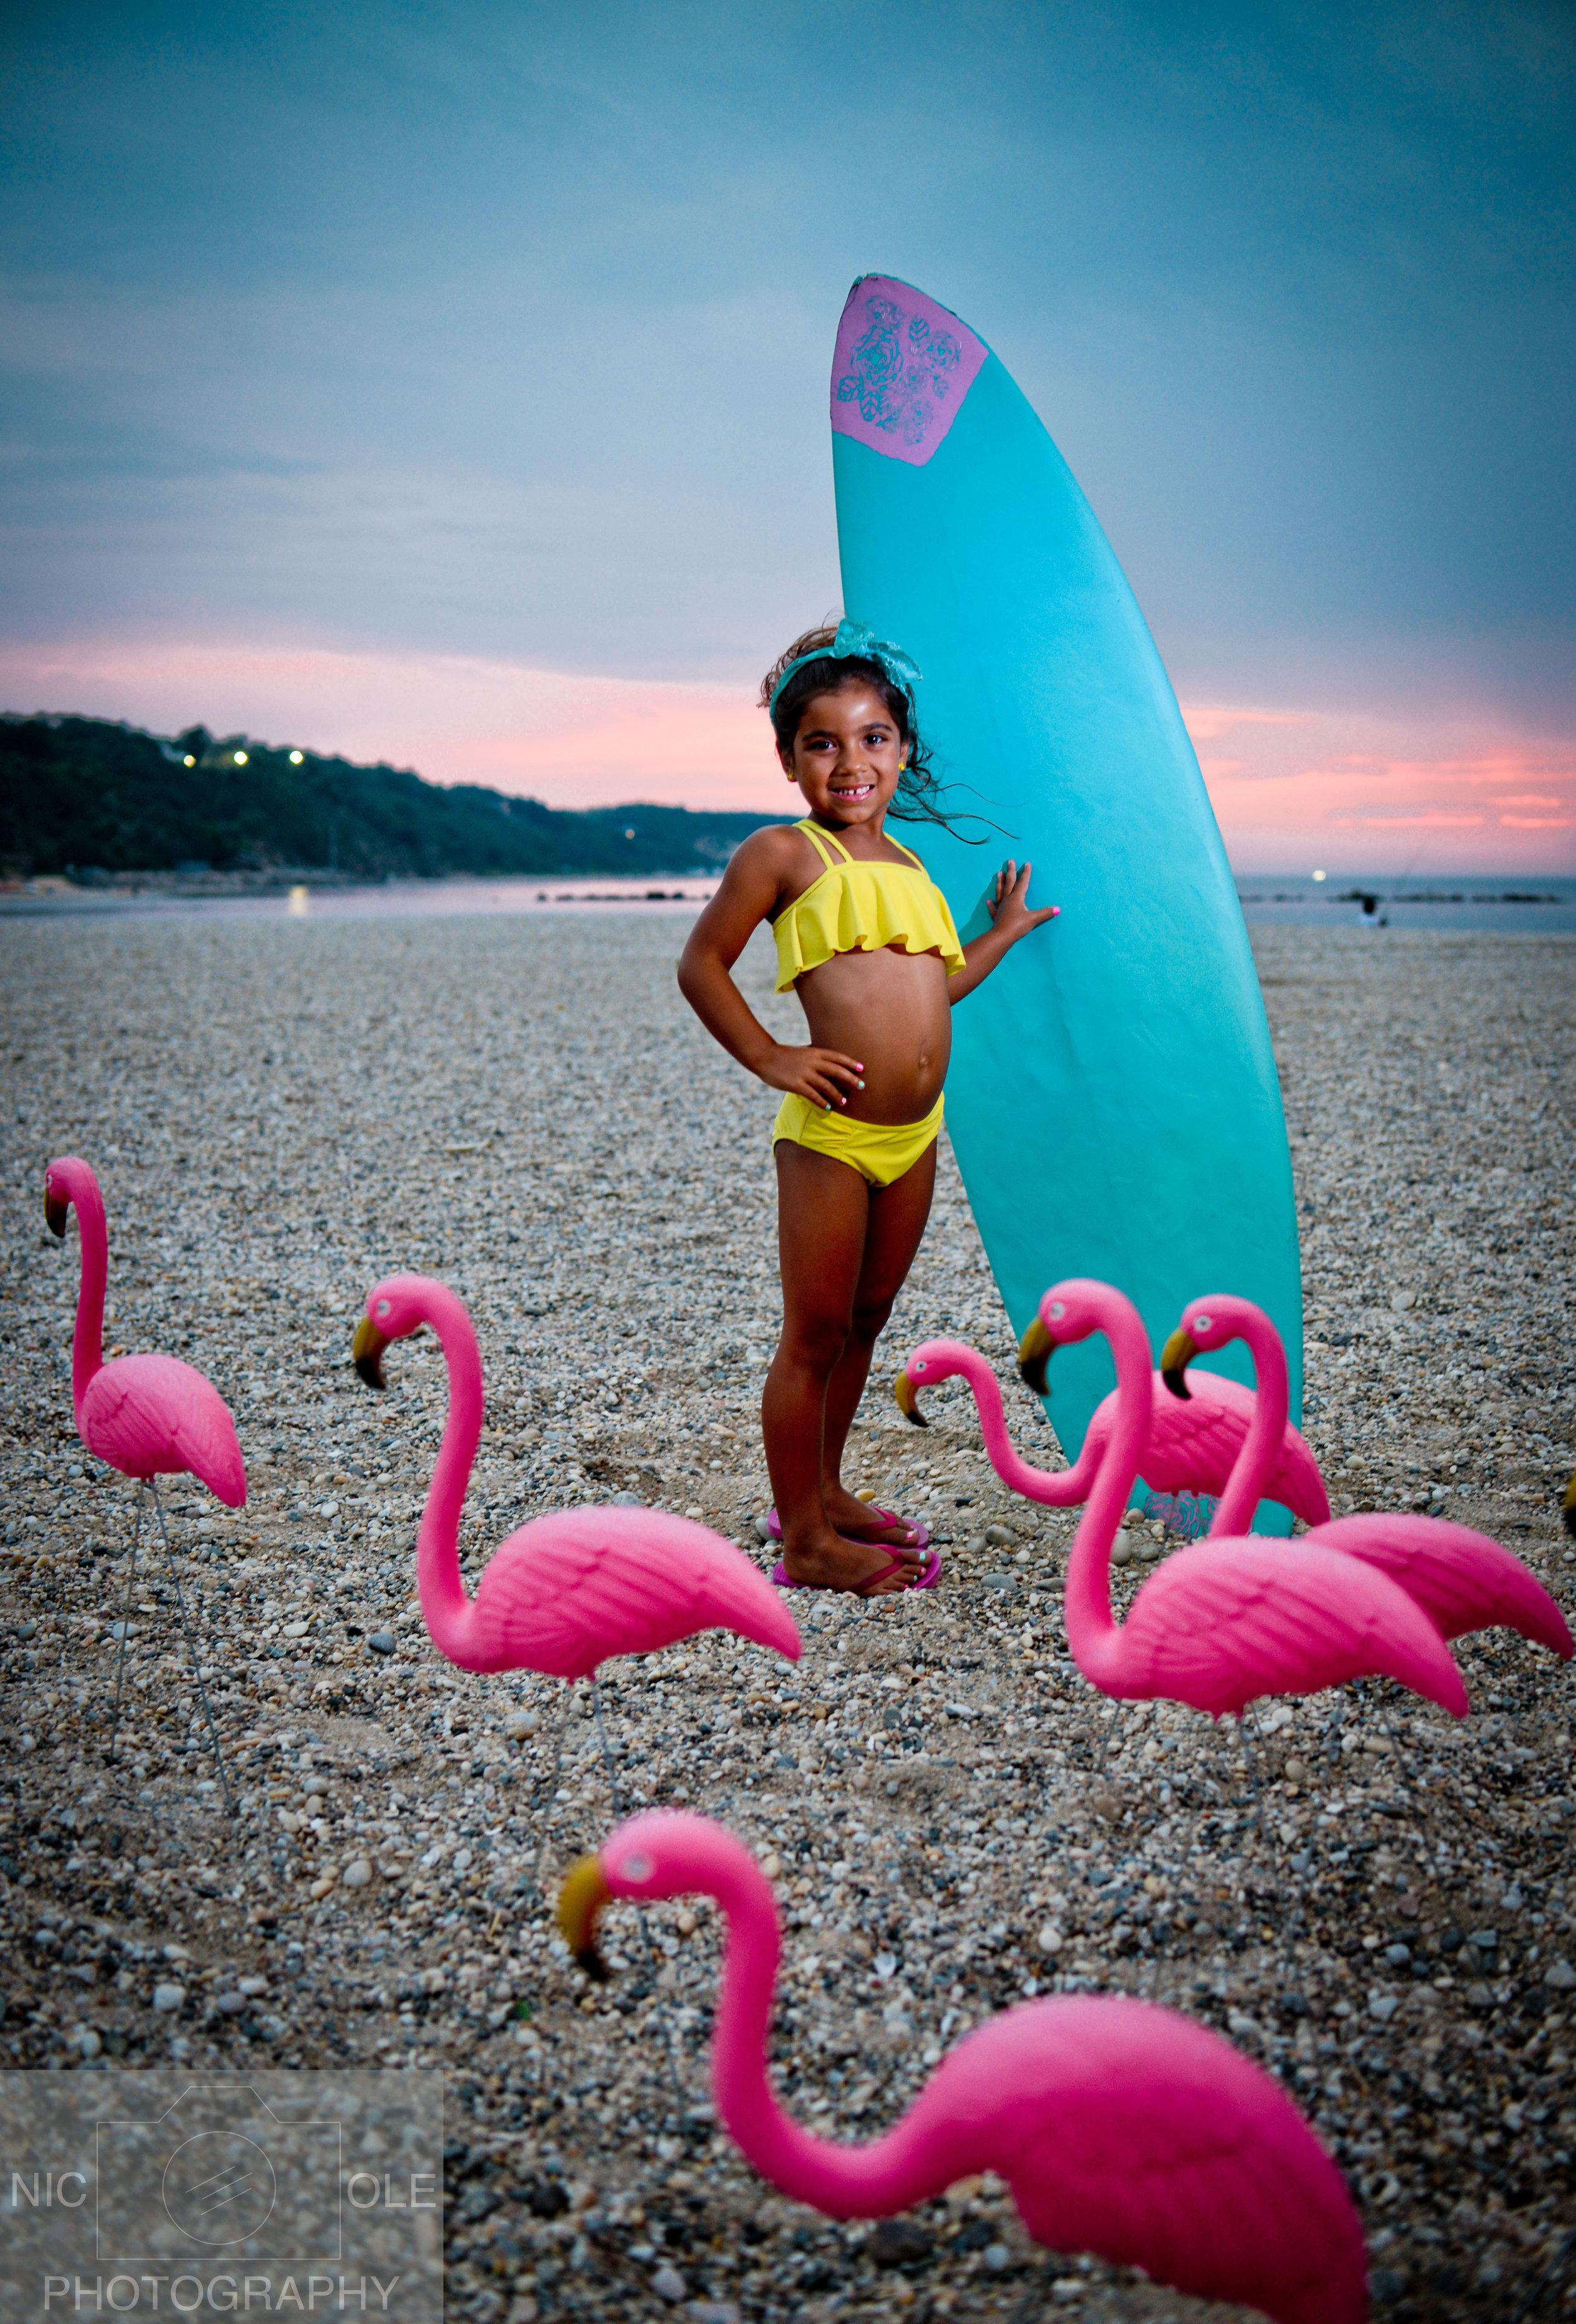 Cielo Noemi Flamingo Beach 7.20.17- NIC-OLE Photography-13.jpg